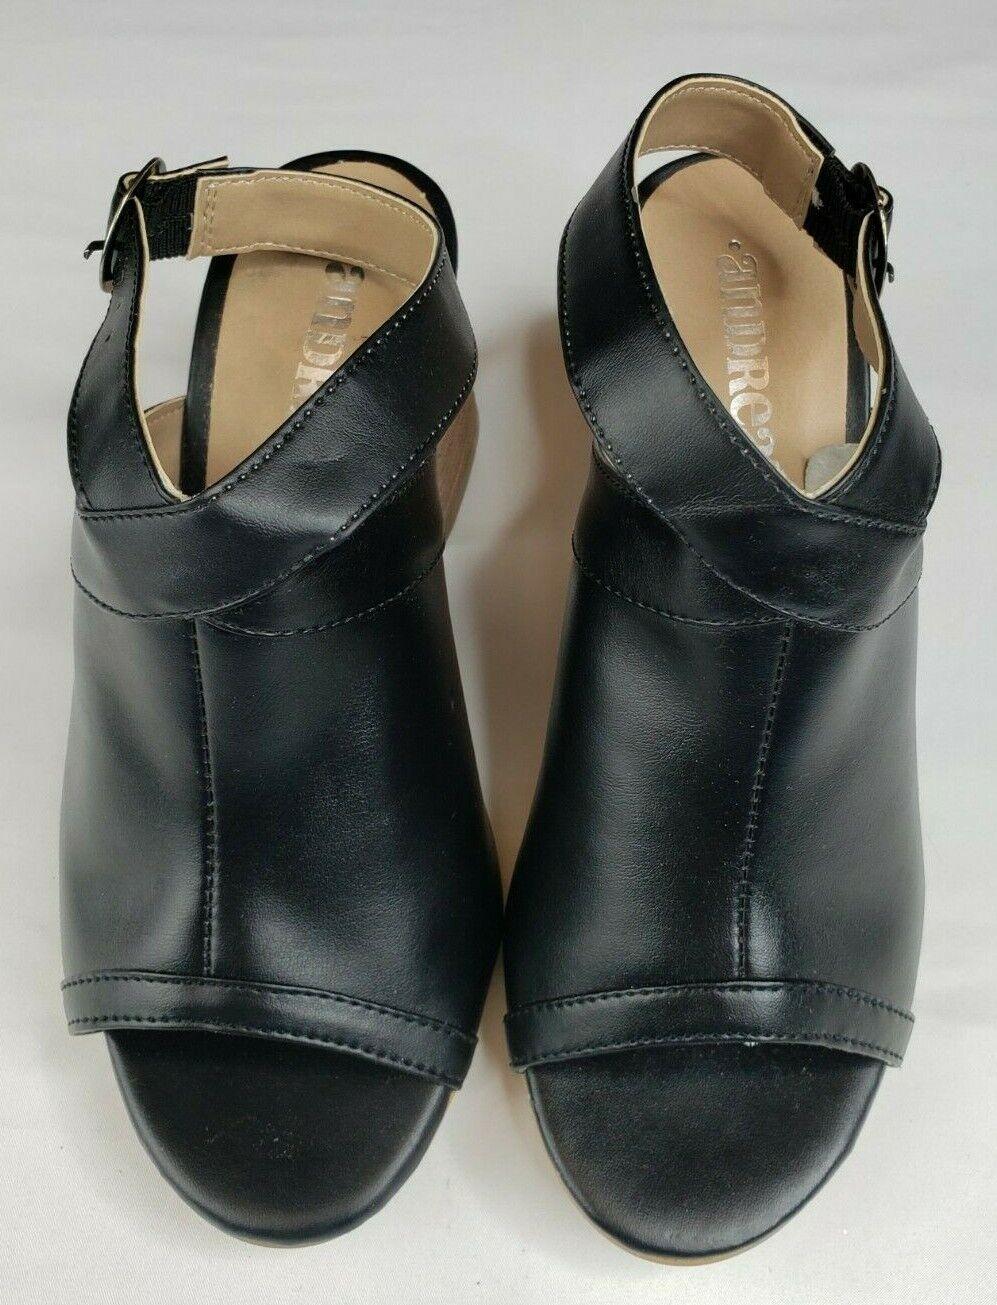 Andrea Women's Black High Heel Shoes Size 5